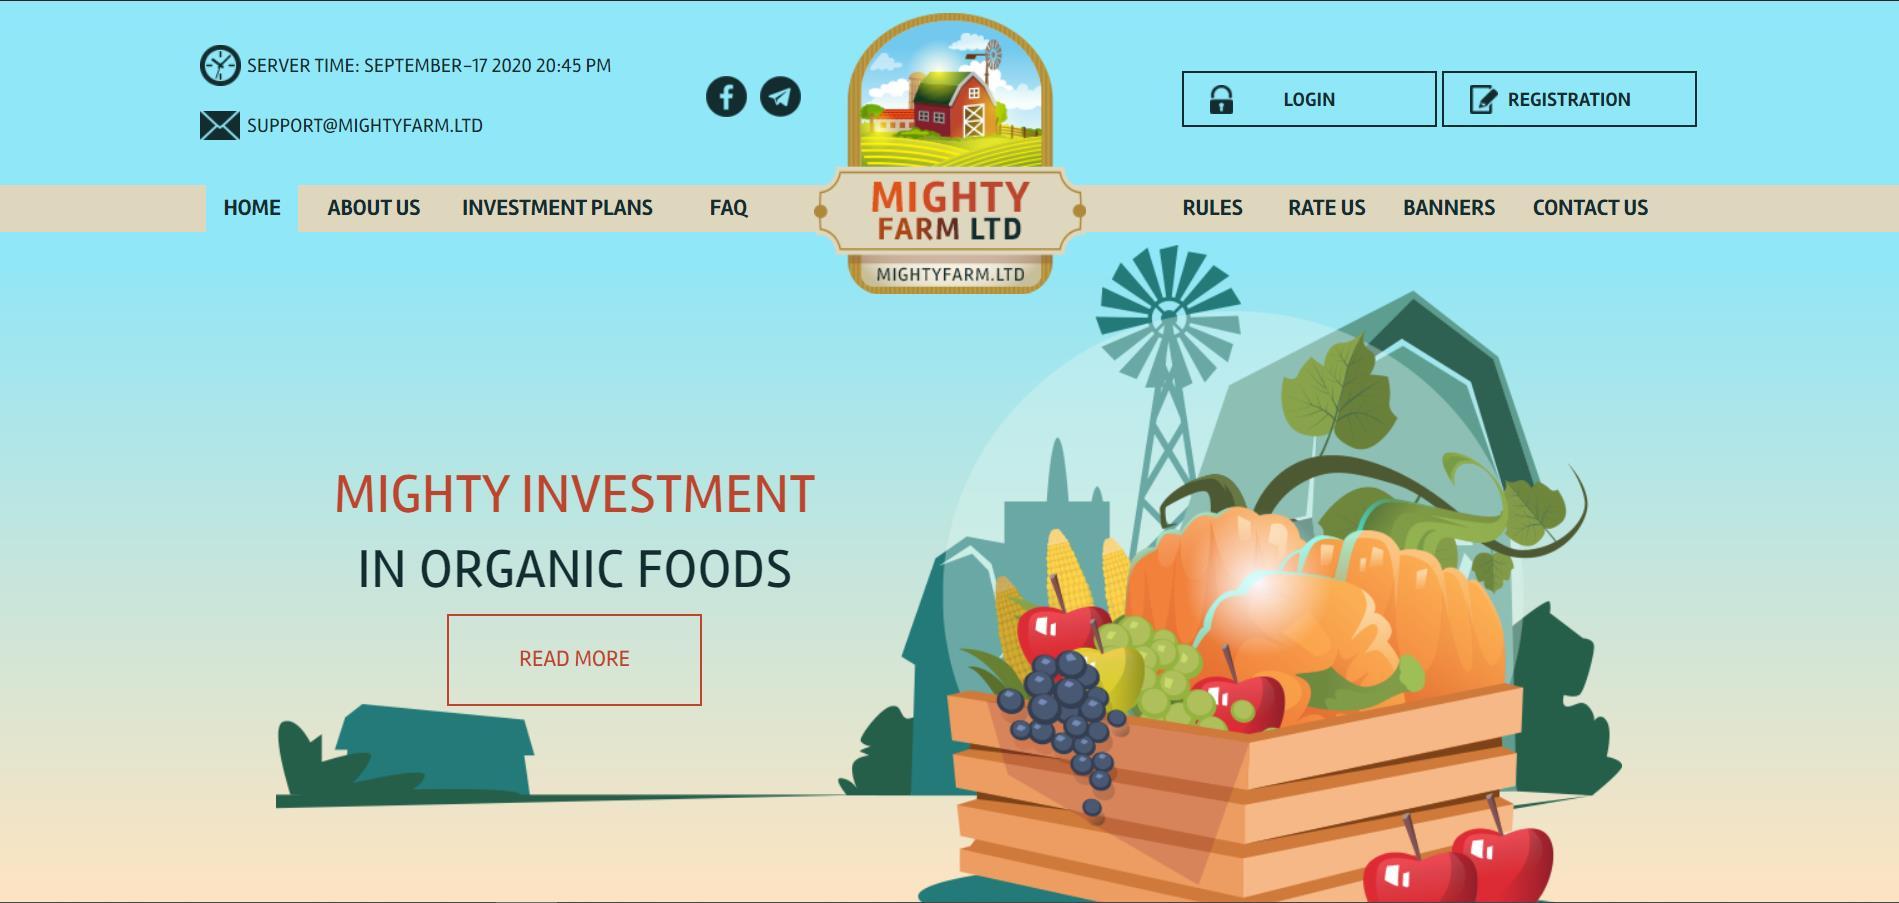 Mighty Farm Ltd